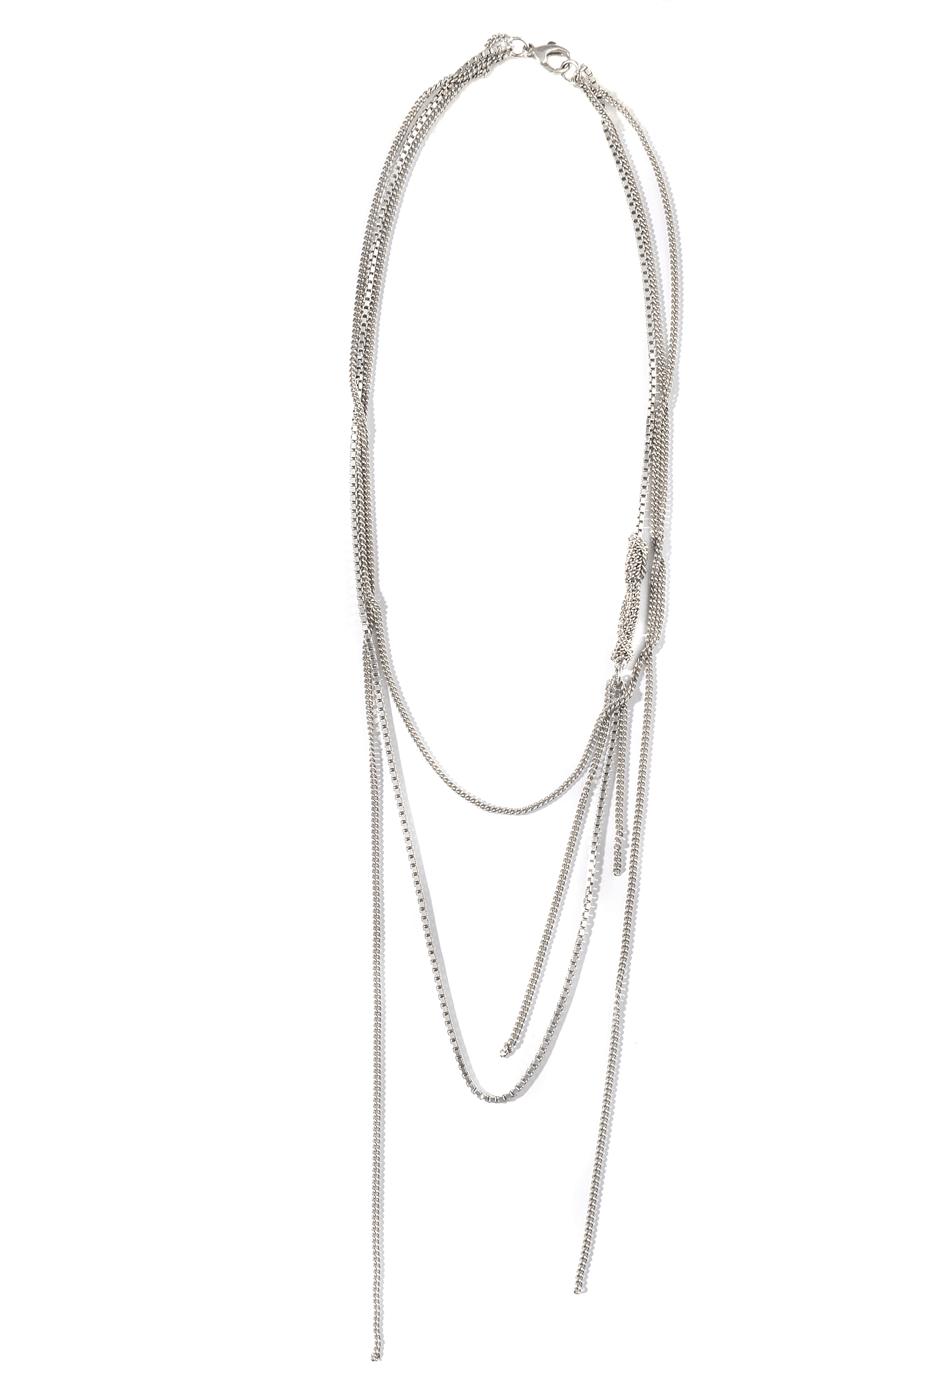 Adeline Cacheux Jewelry Design Collier chaîne